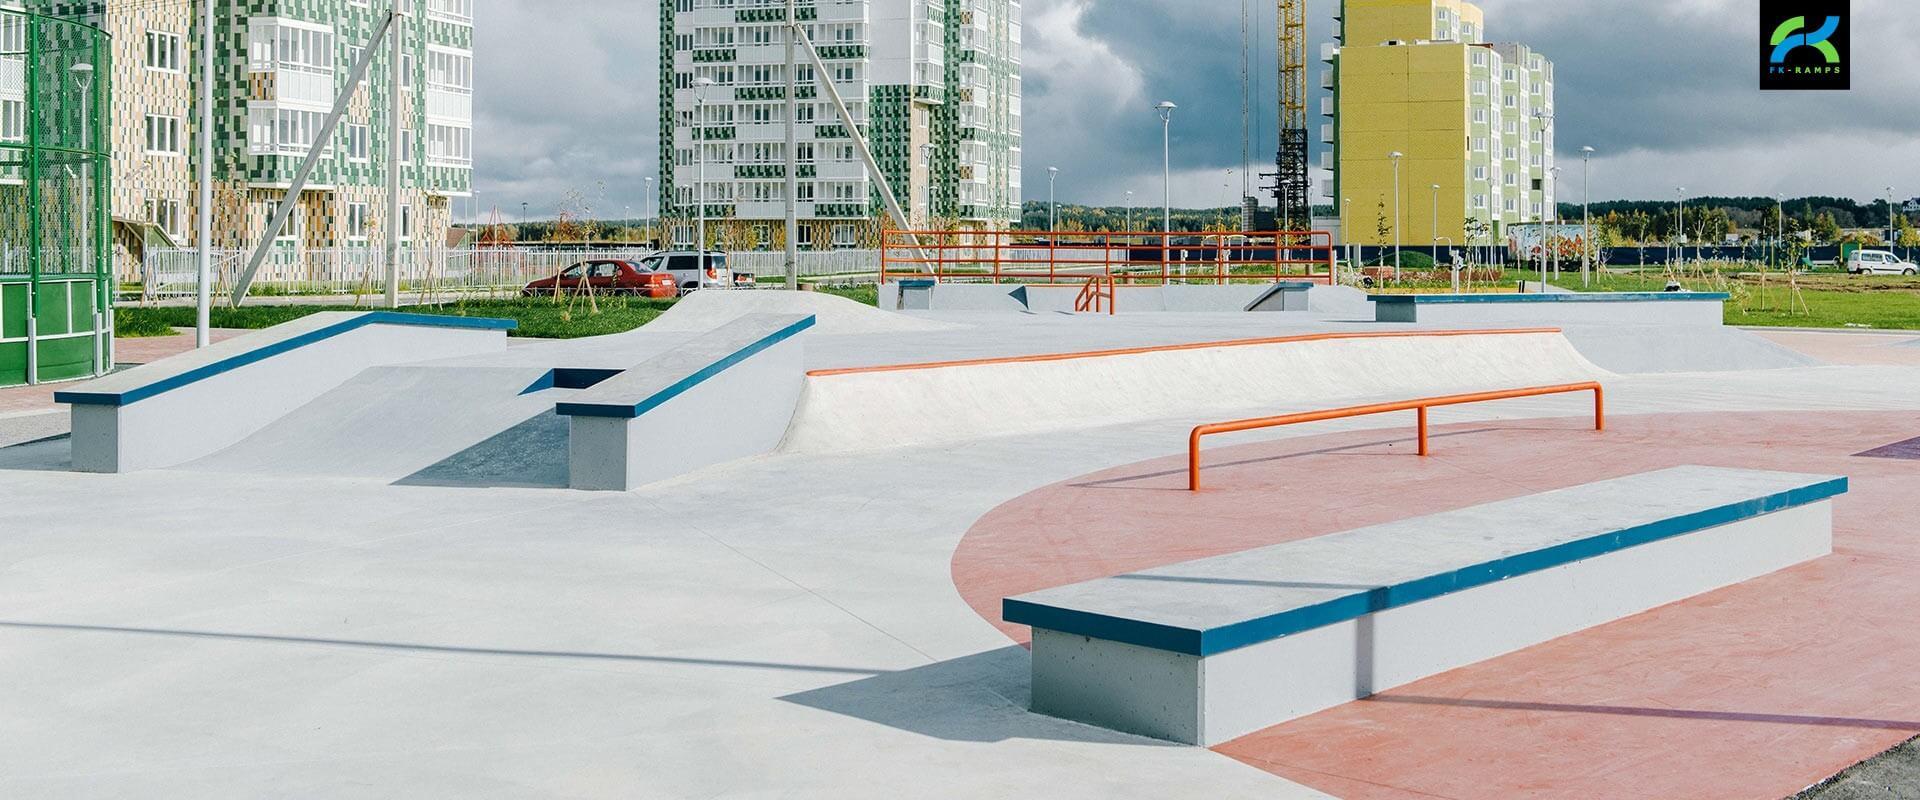 Скейт парки для архитектурных компаний - FK-ramps